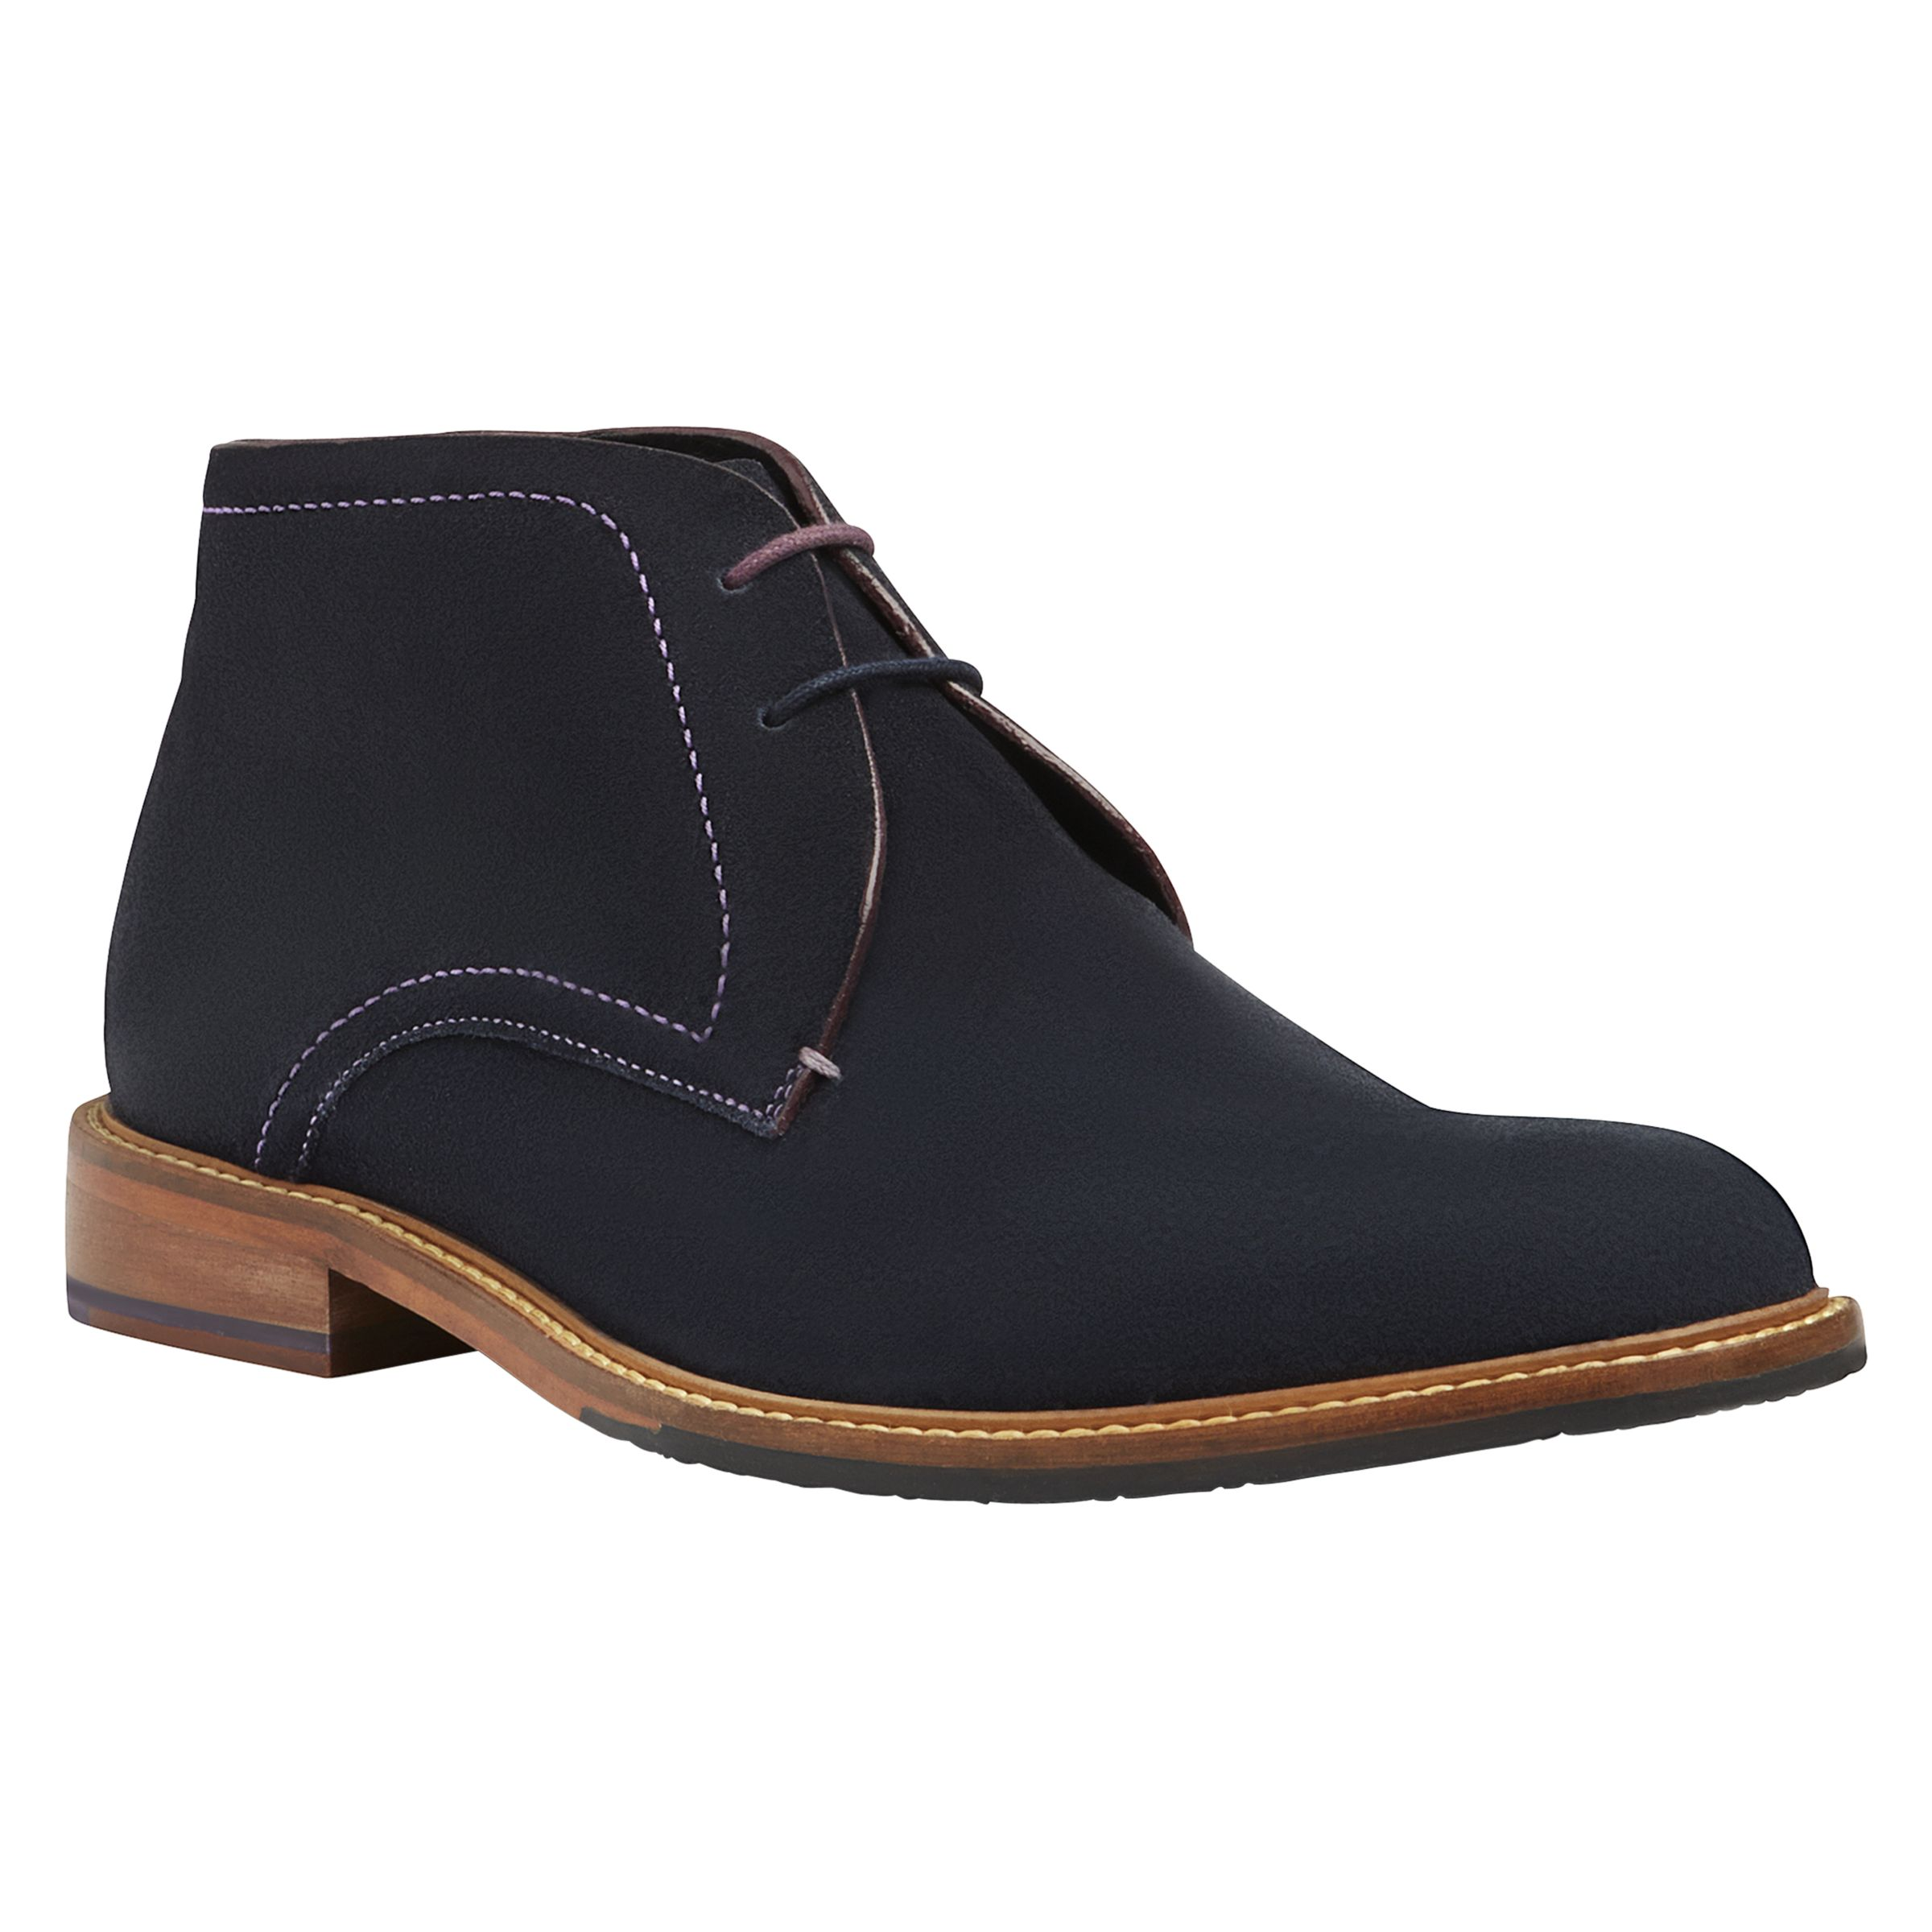 b470537a4b49 Ted Baker Torsdi Boots at John Lewis   Partners